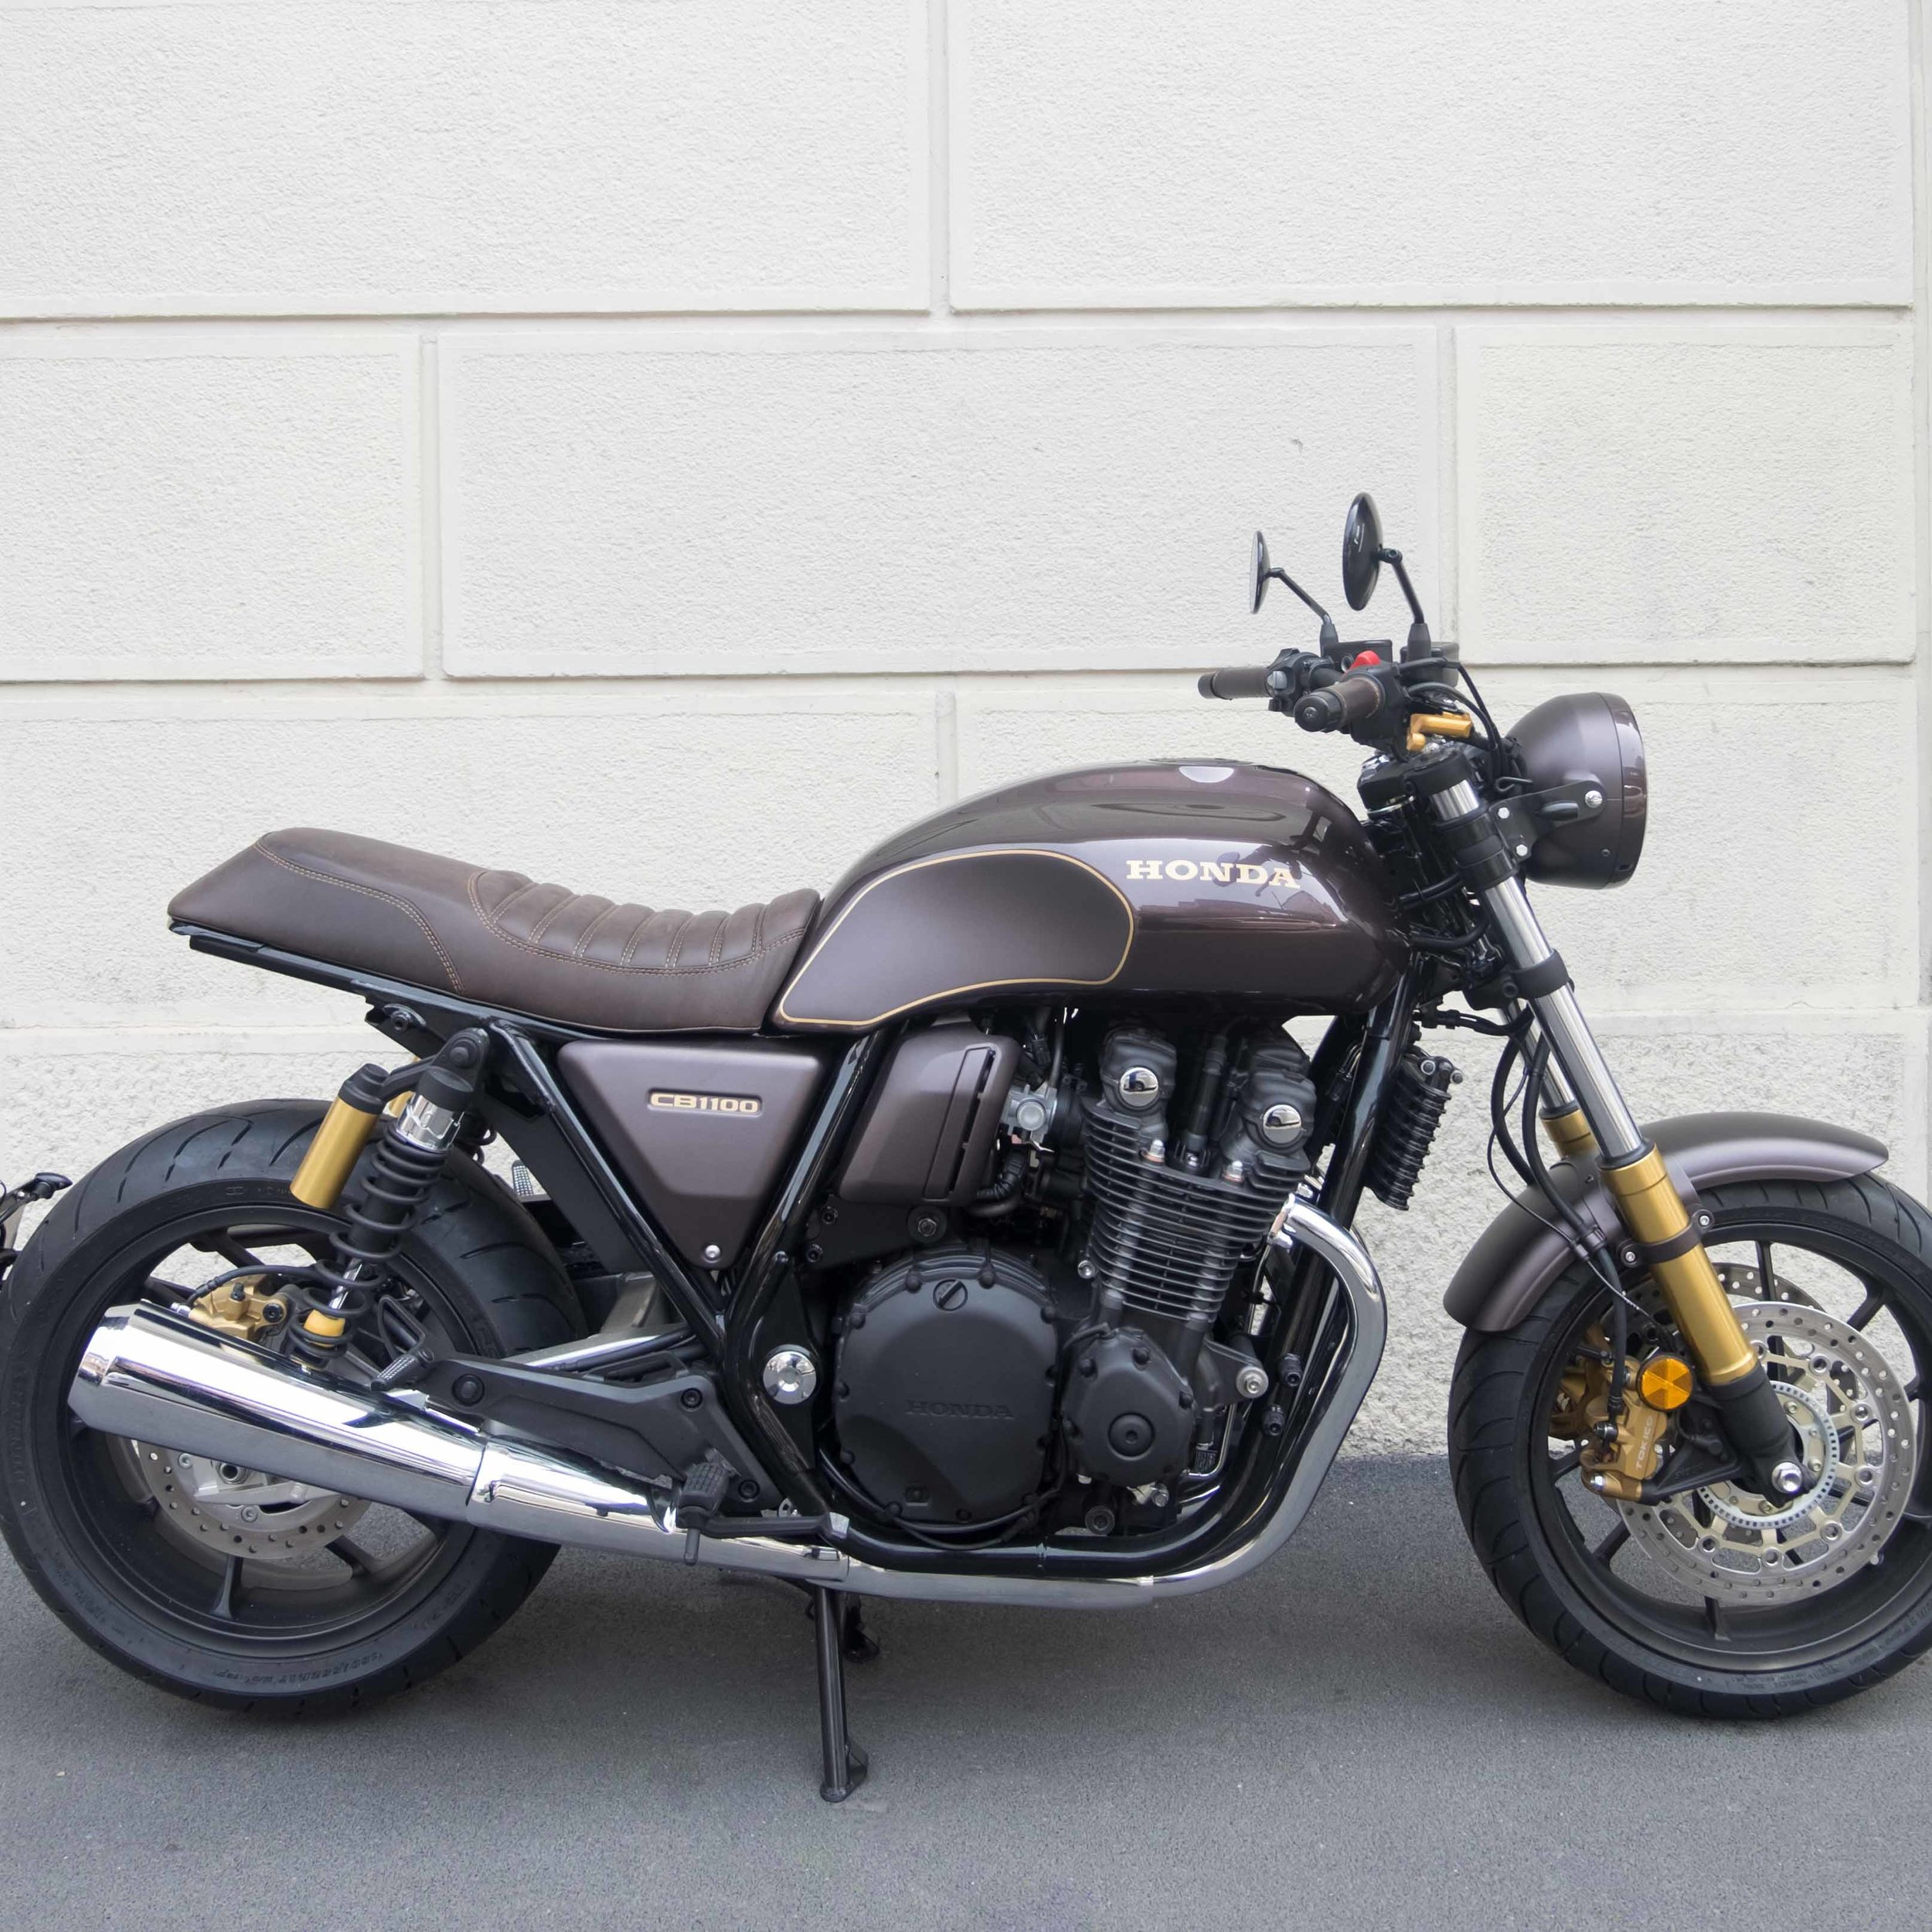 Marca: Honda Modello: CB1100 (Special Officine Mermaid)  055